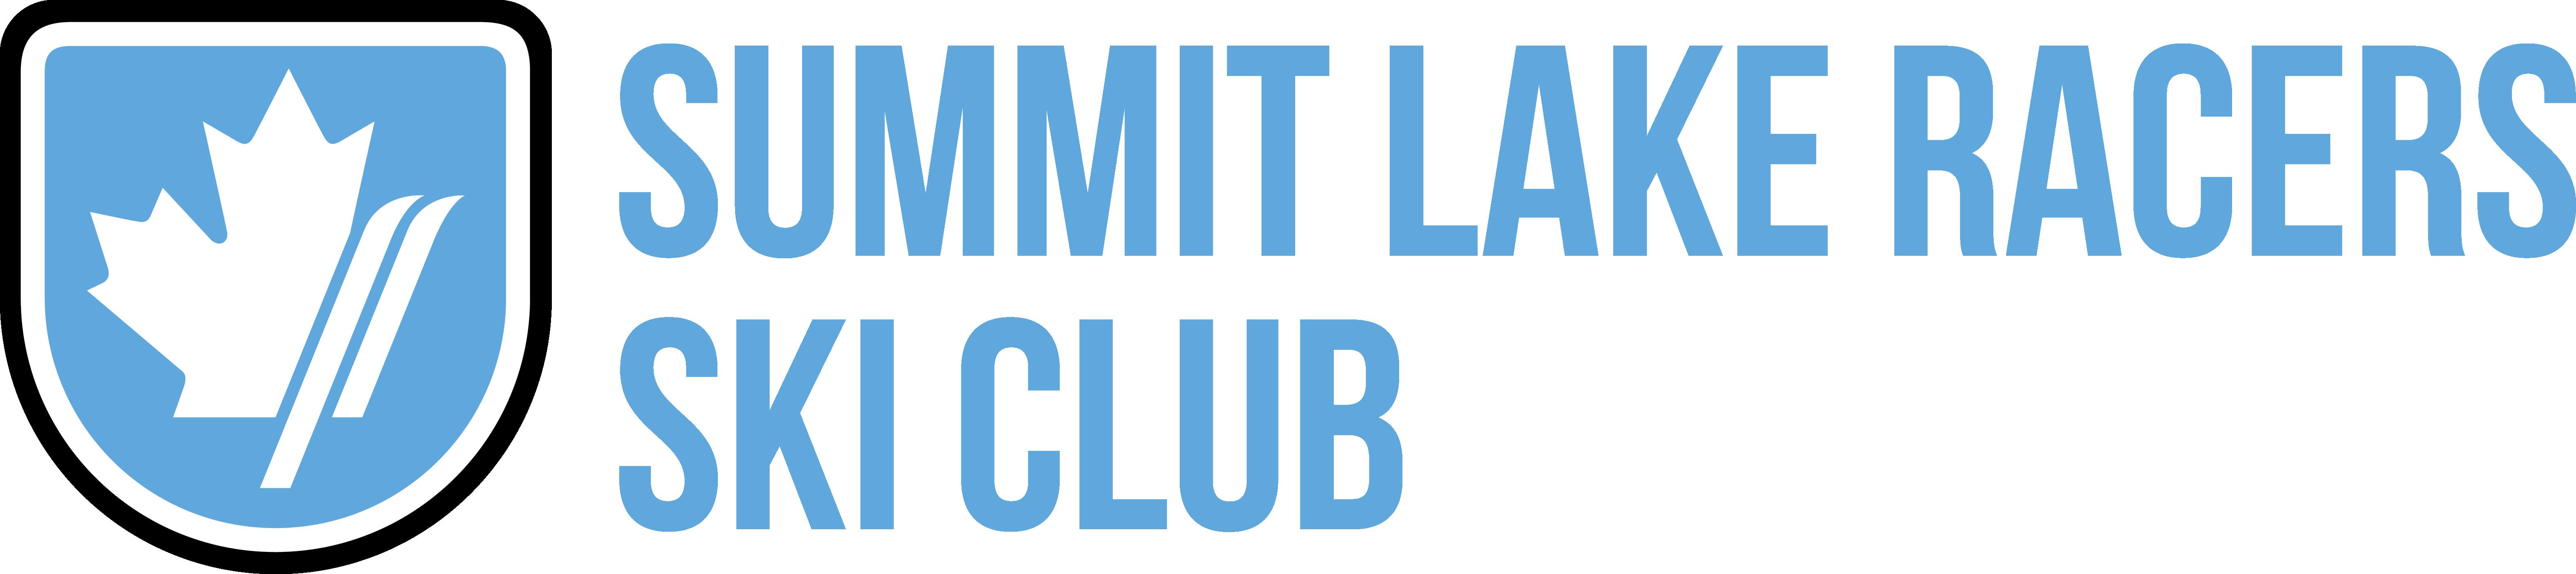 Summit Lake Racers Ski CLub